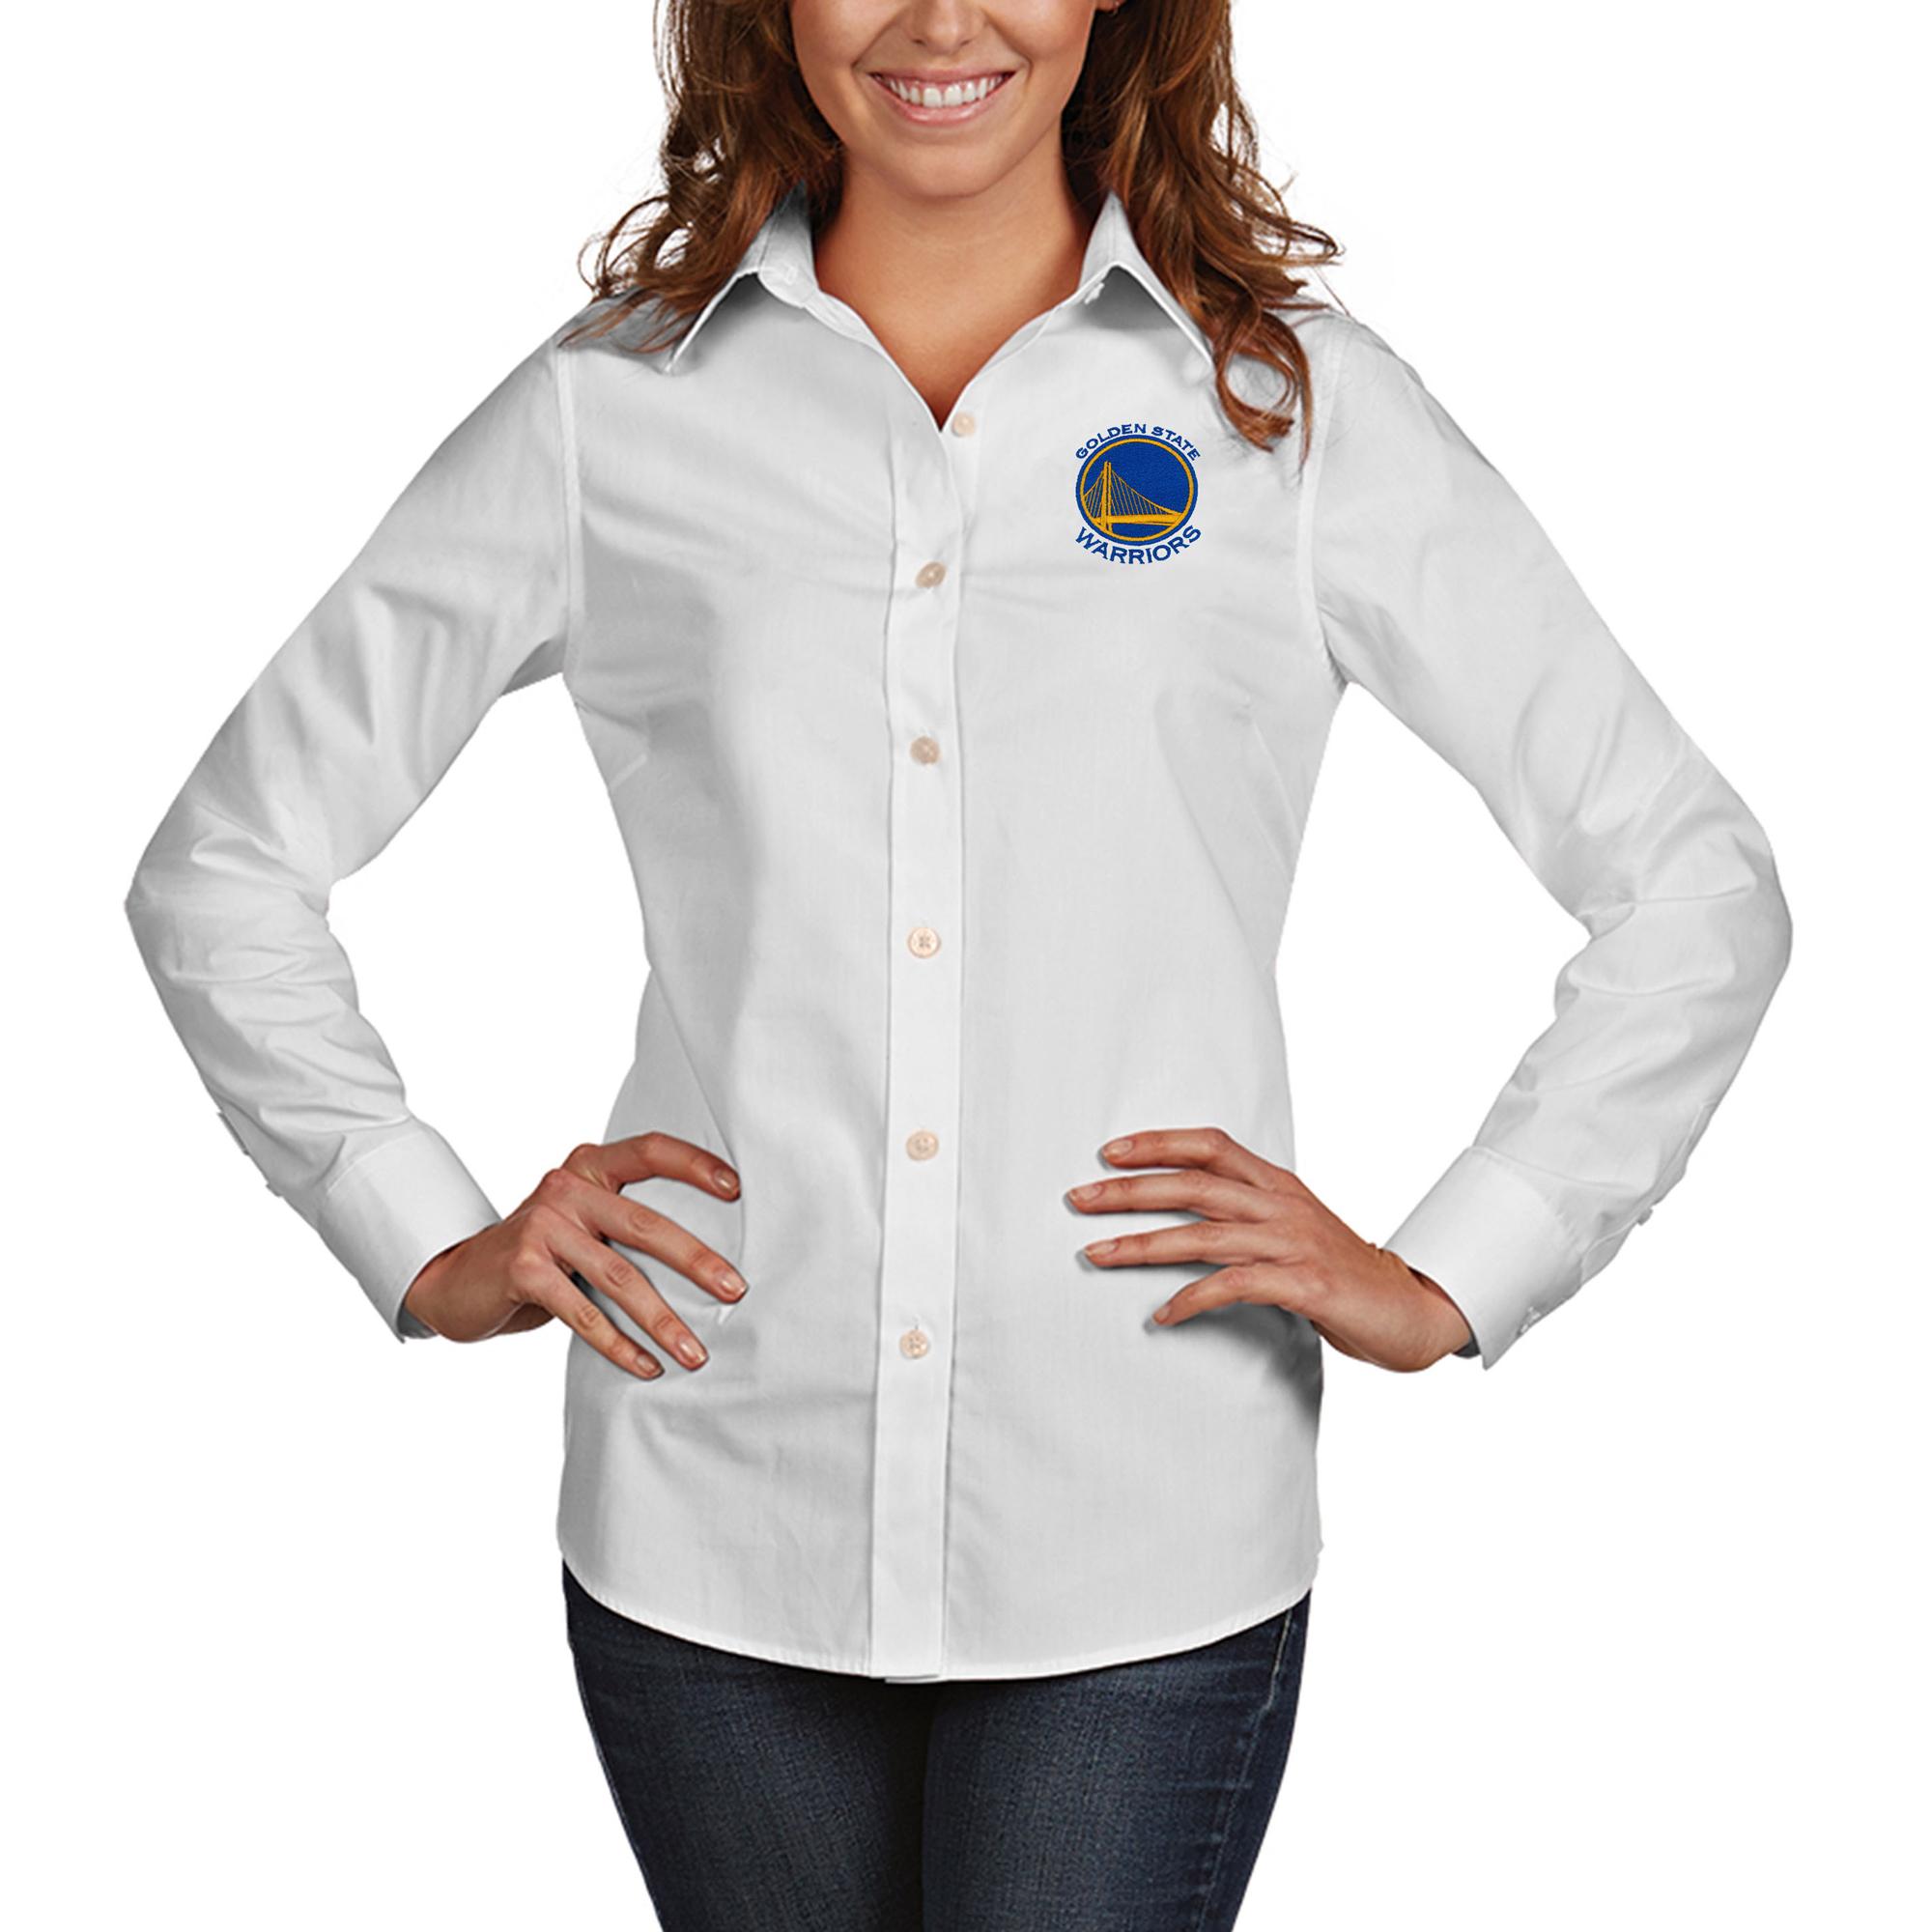 Golden State Warriors Antigua Women's Dynasty Woven Button-Up Long Sleeve Shirt - White